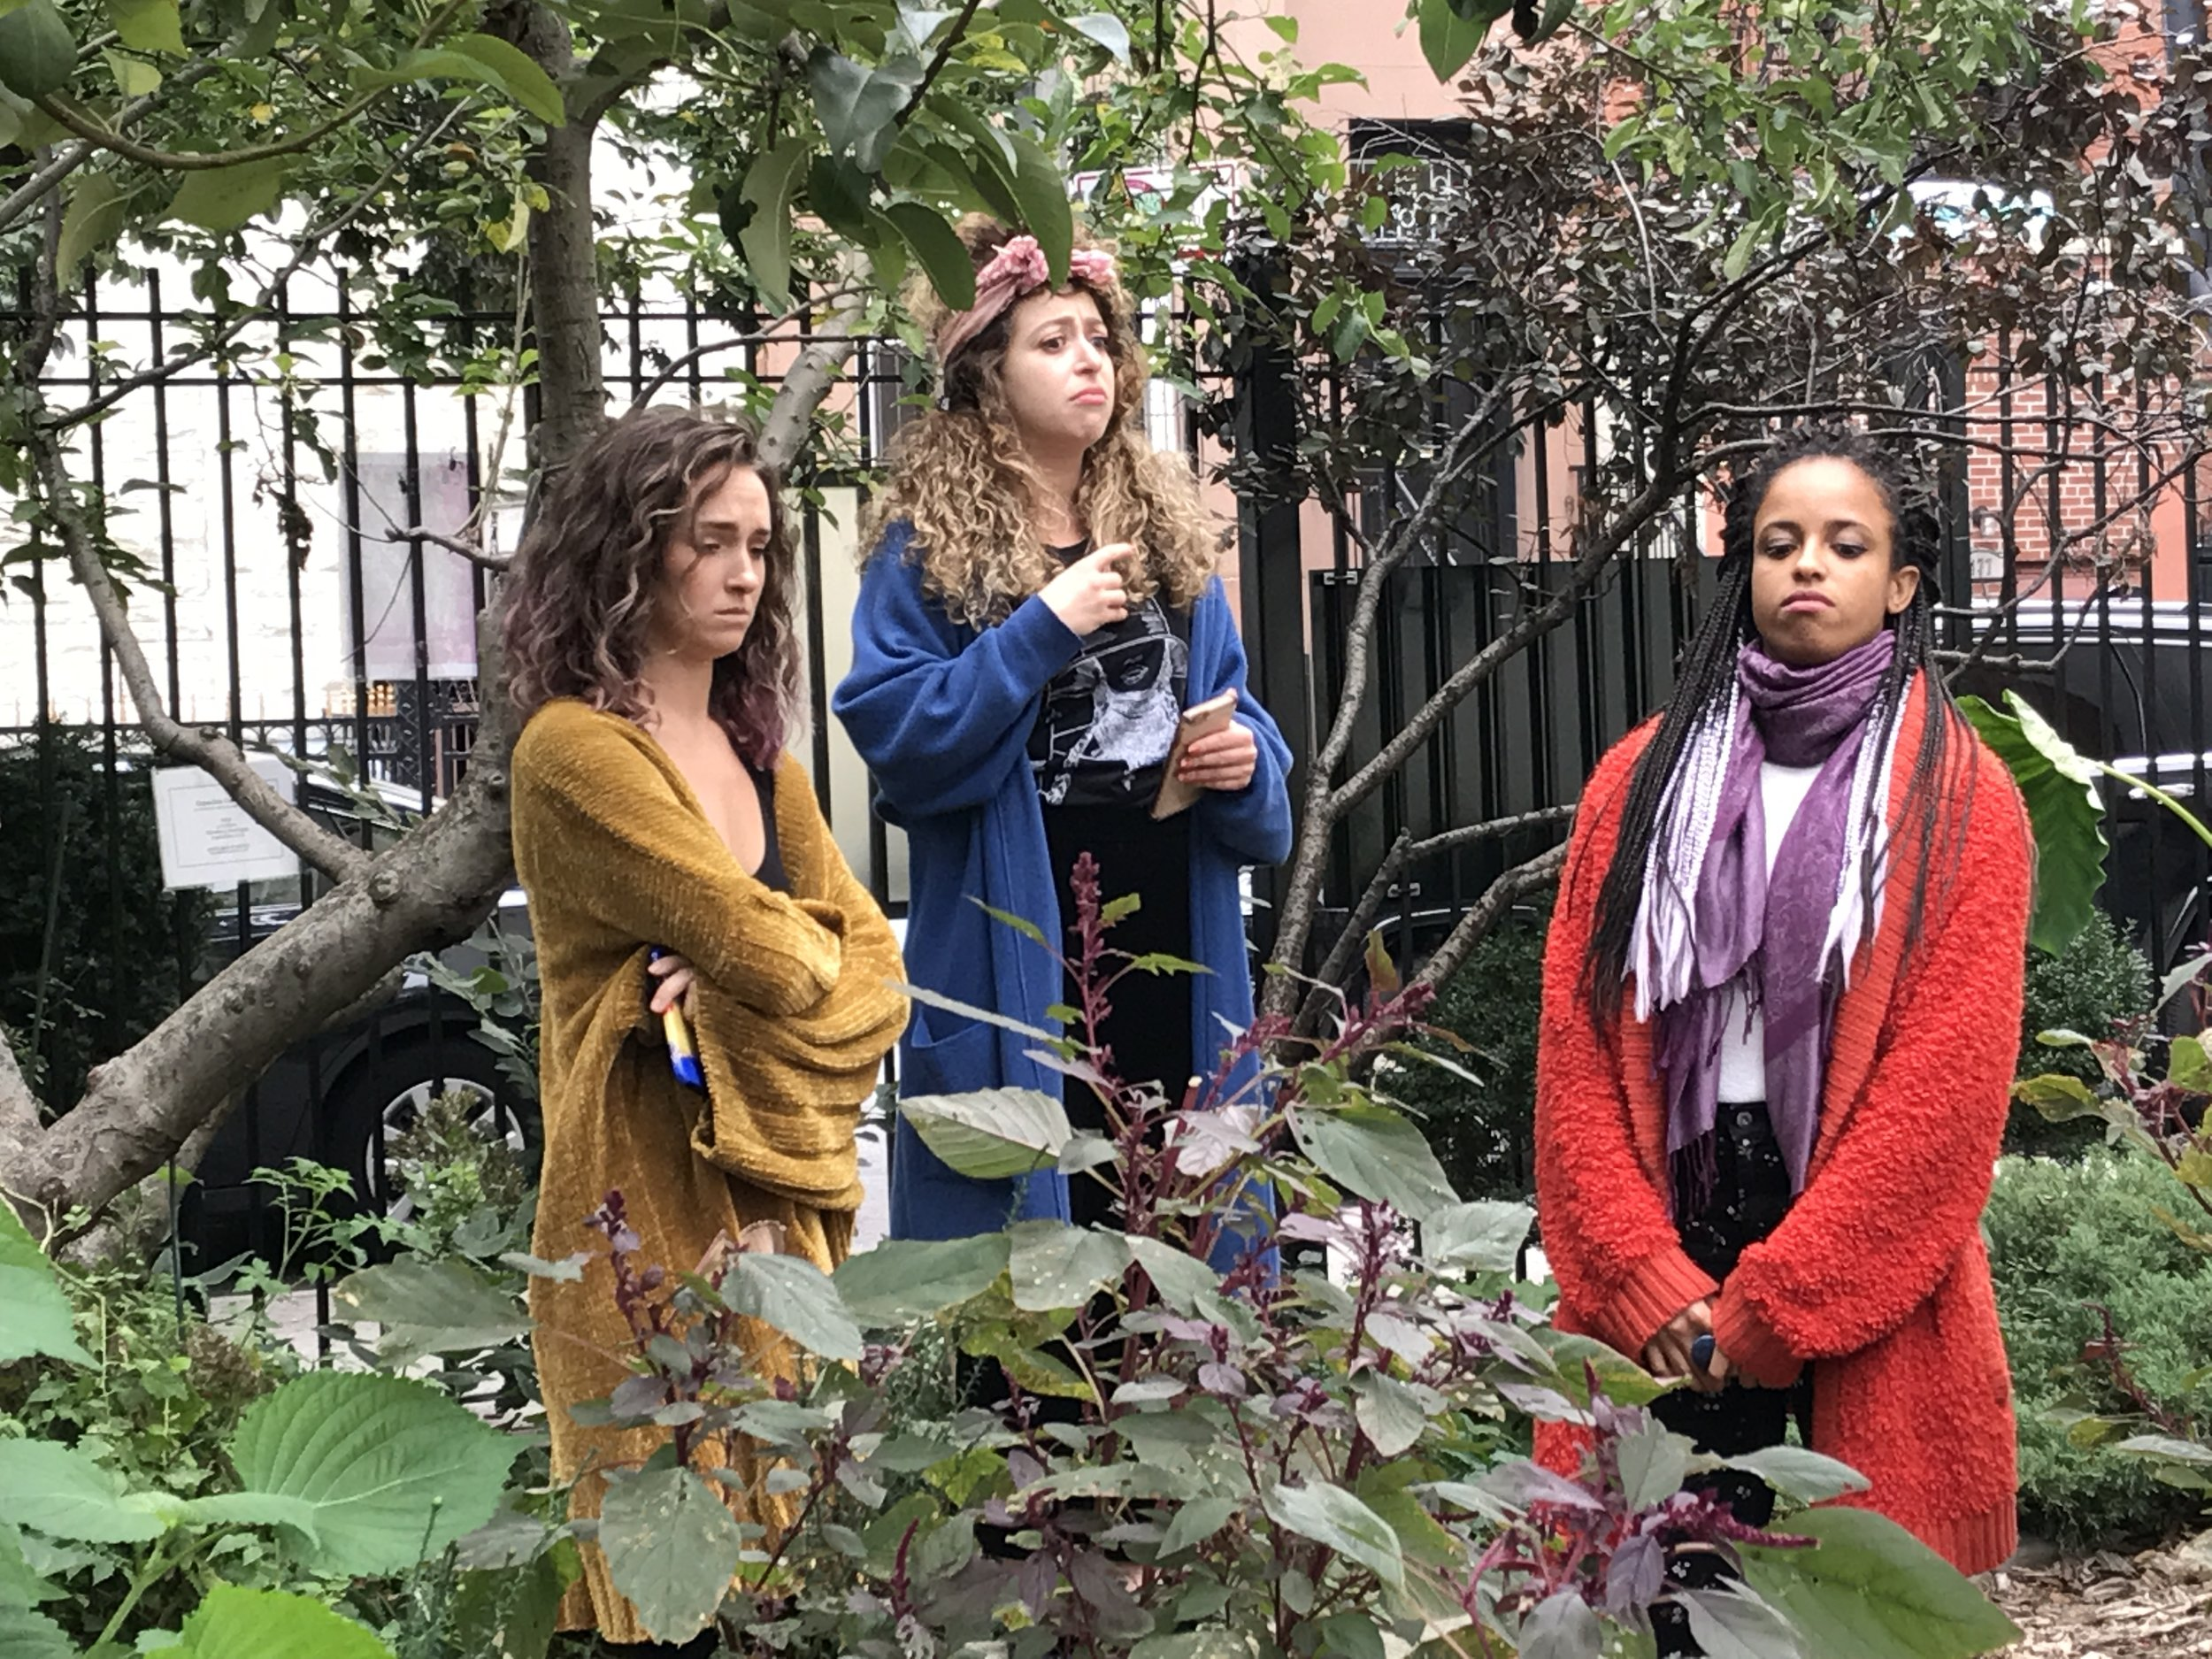 Bradley Mckelvey-Askin, Irina Kaplan, Stephanie Rocío